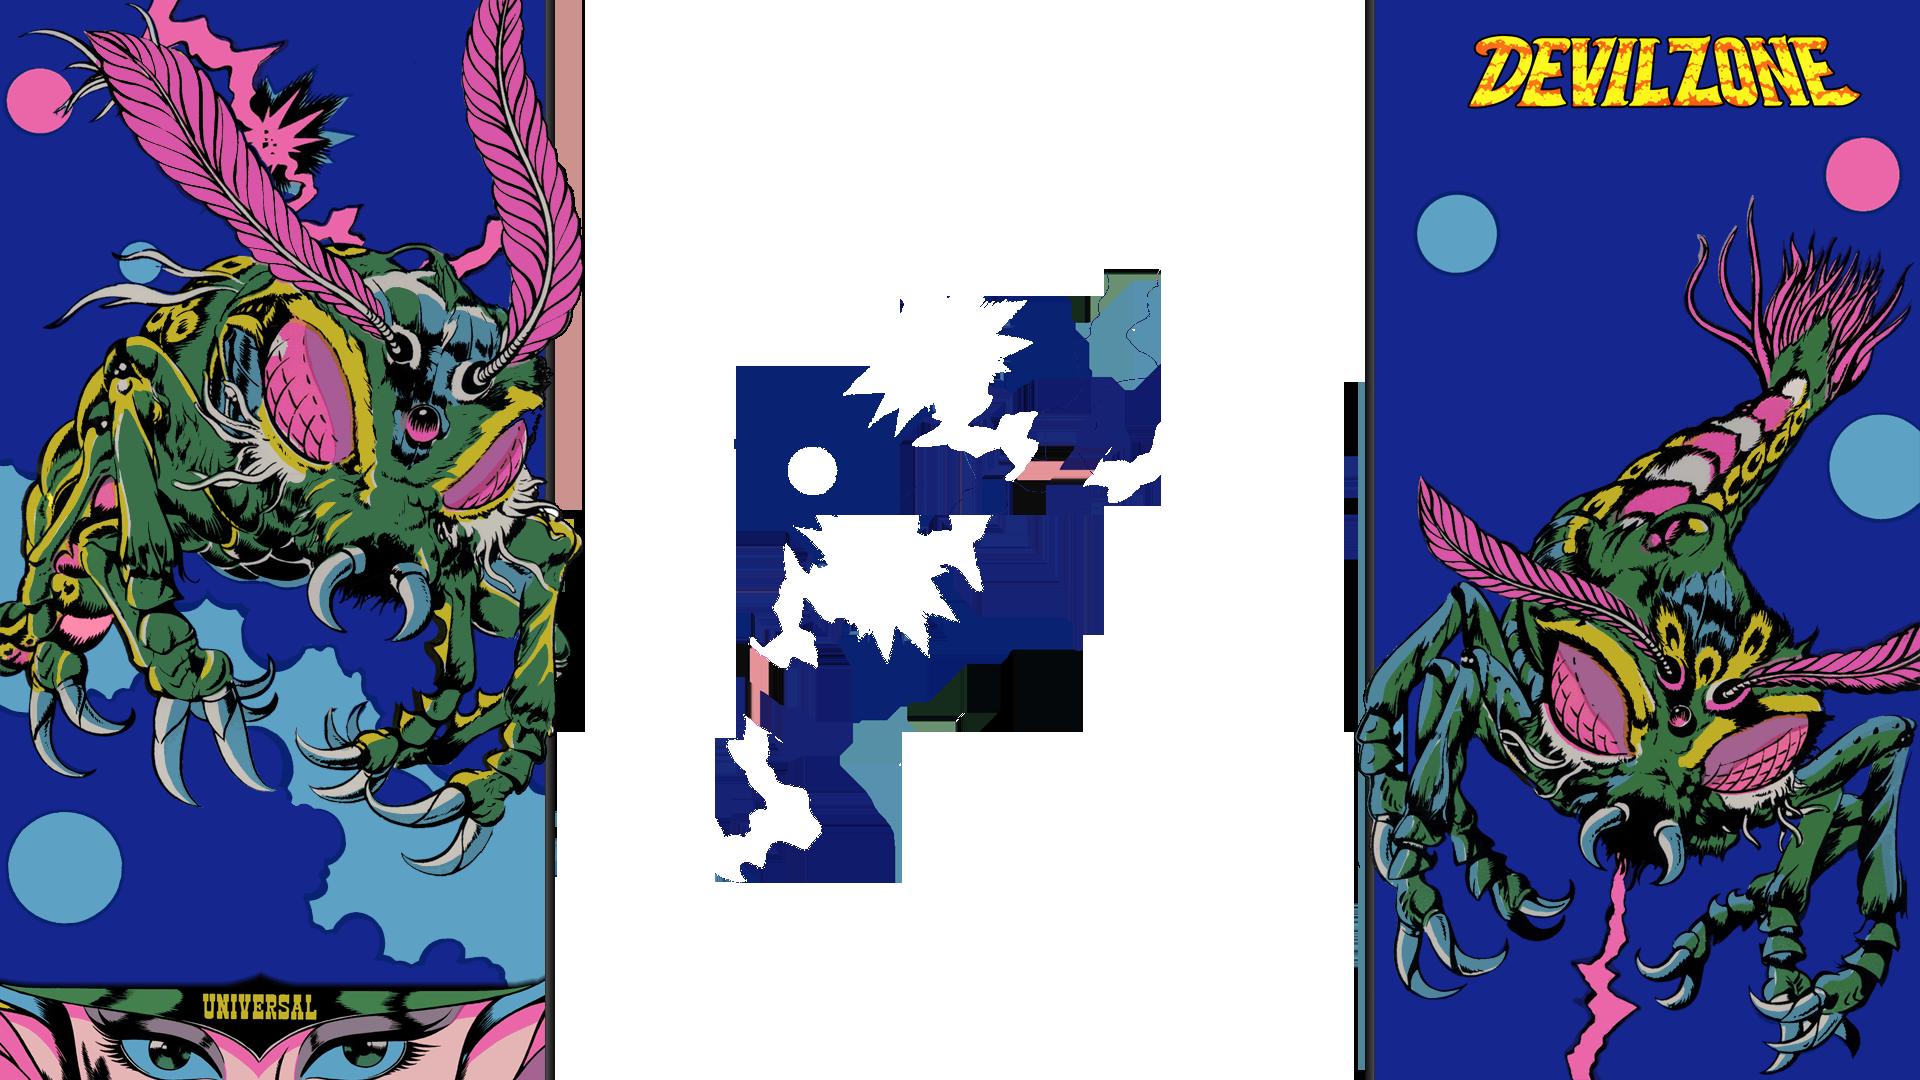 Devil Zone 1080p overlay